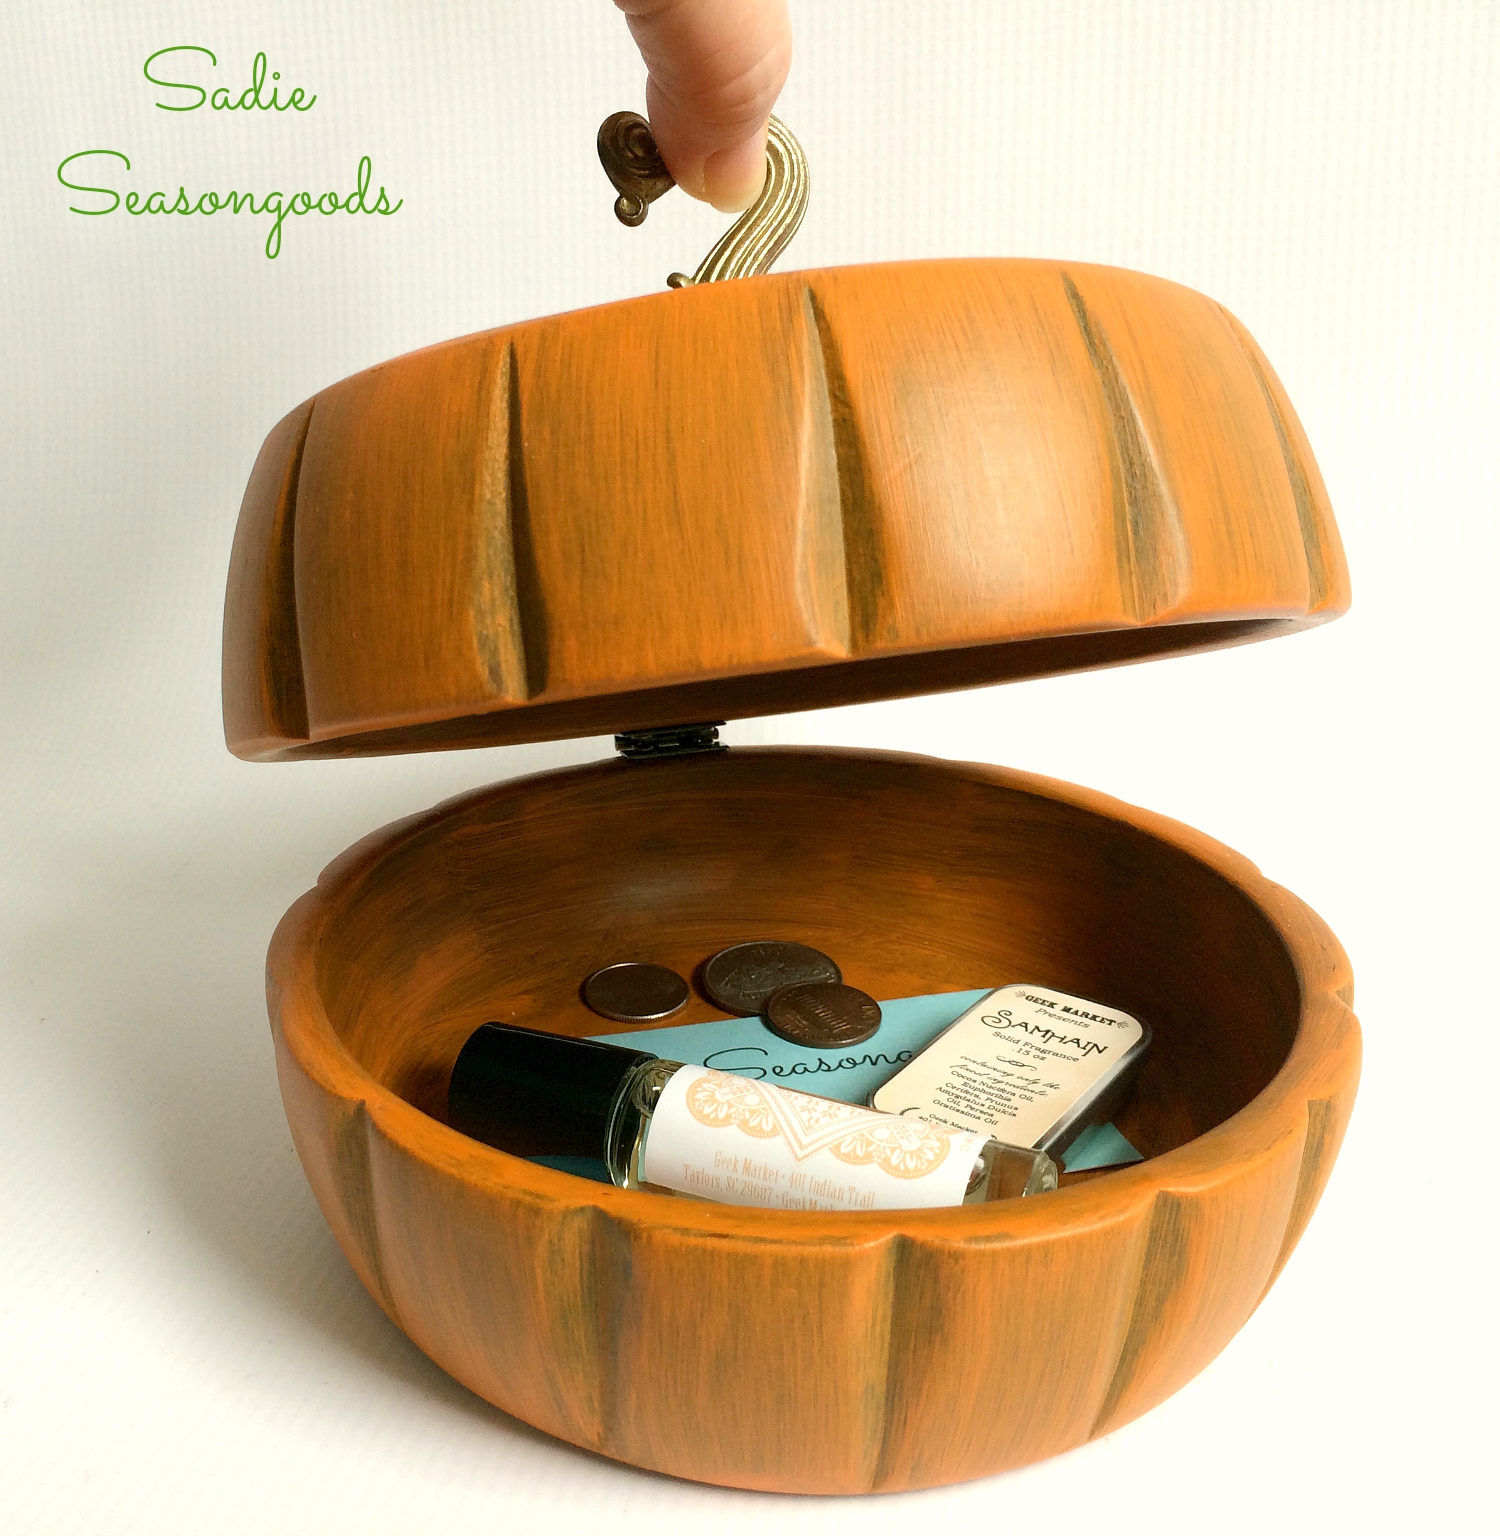 Salad bowls turned pumpkin storage, by Sadie Seasongoods, featured on Funky Junk Interiors